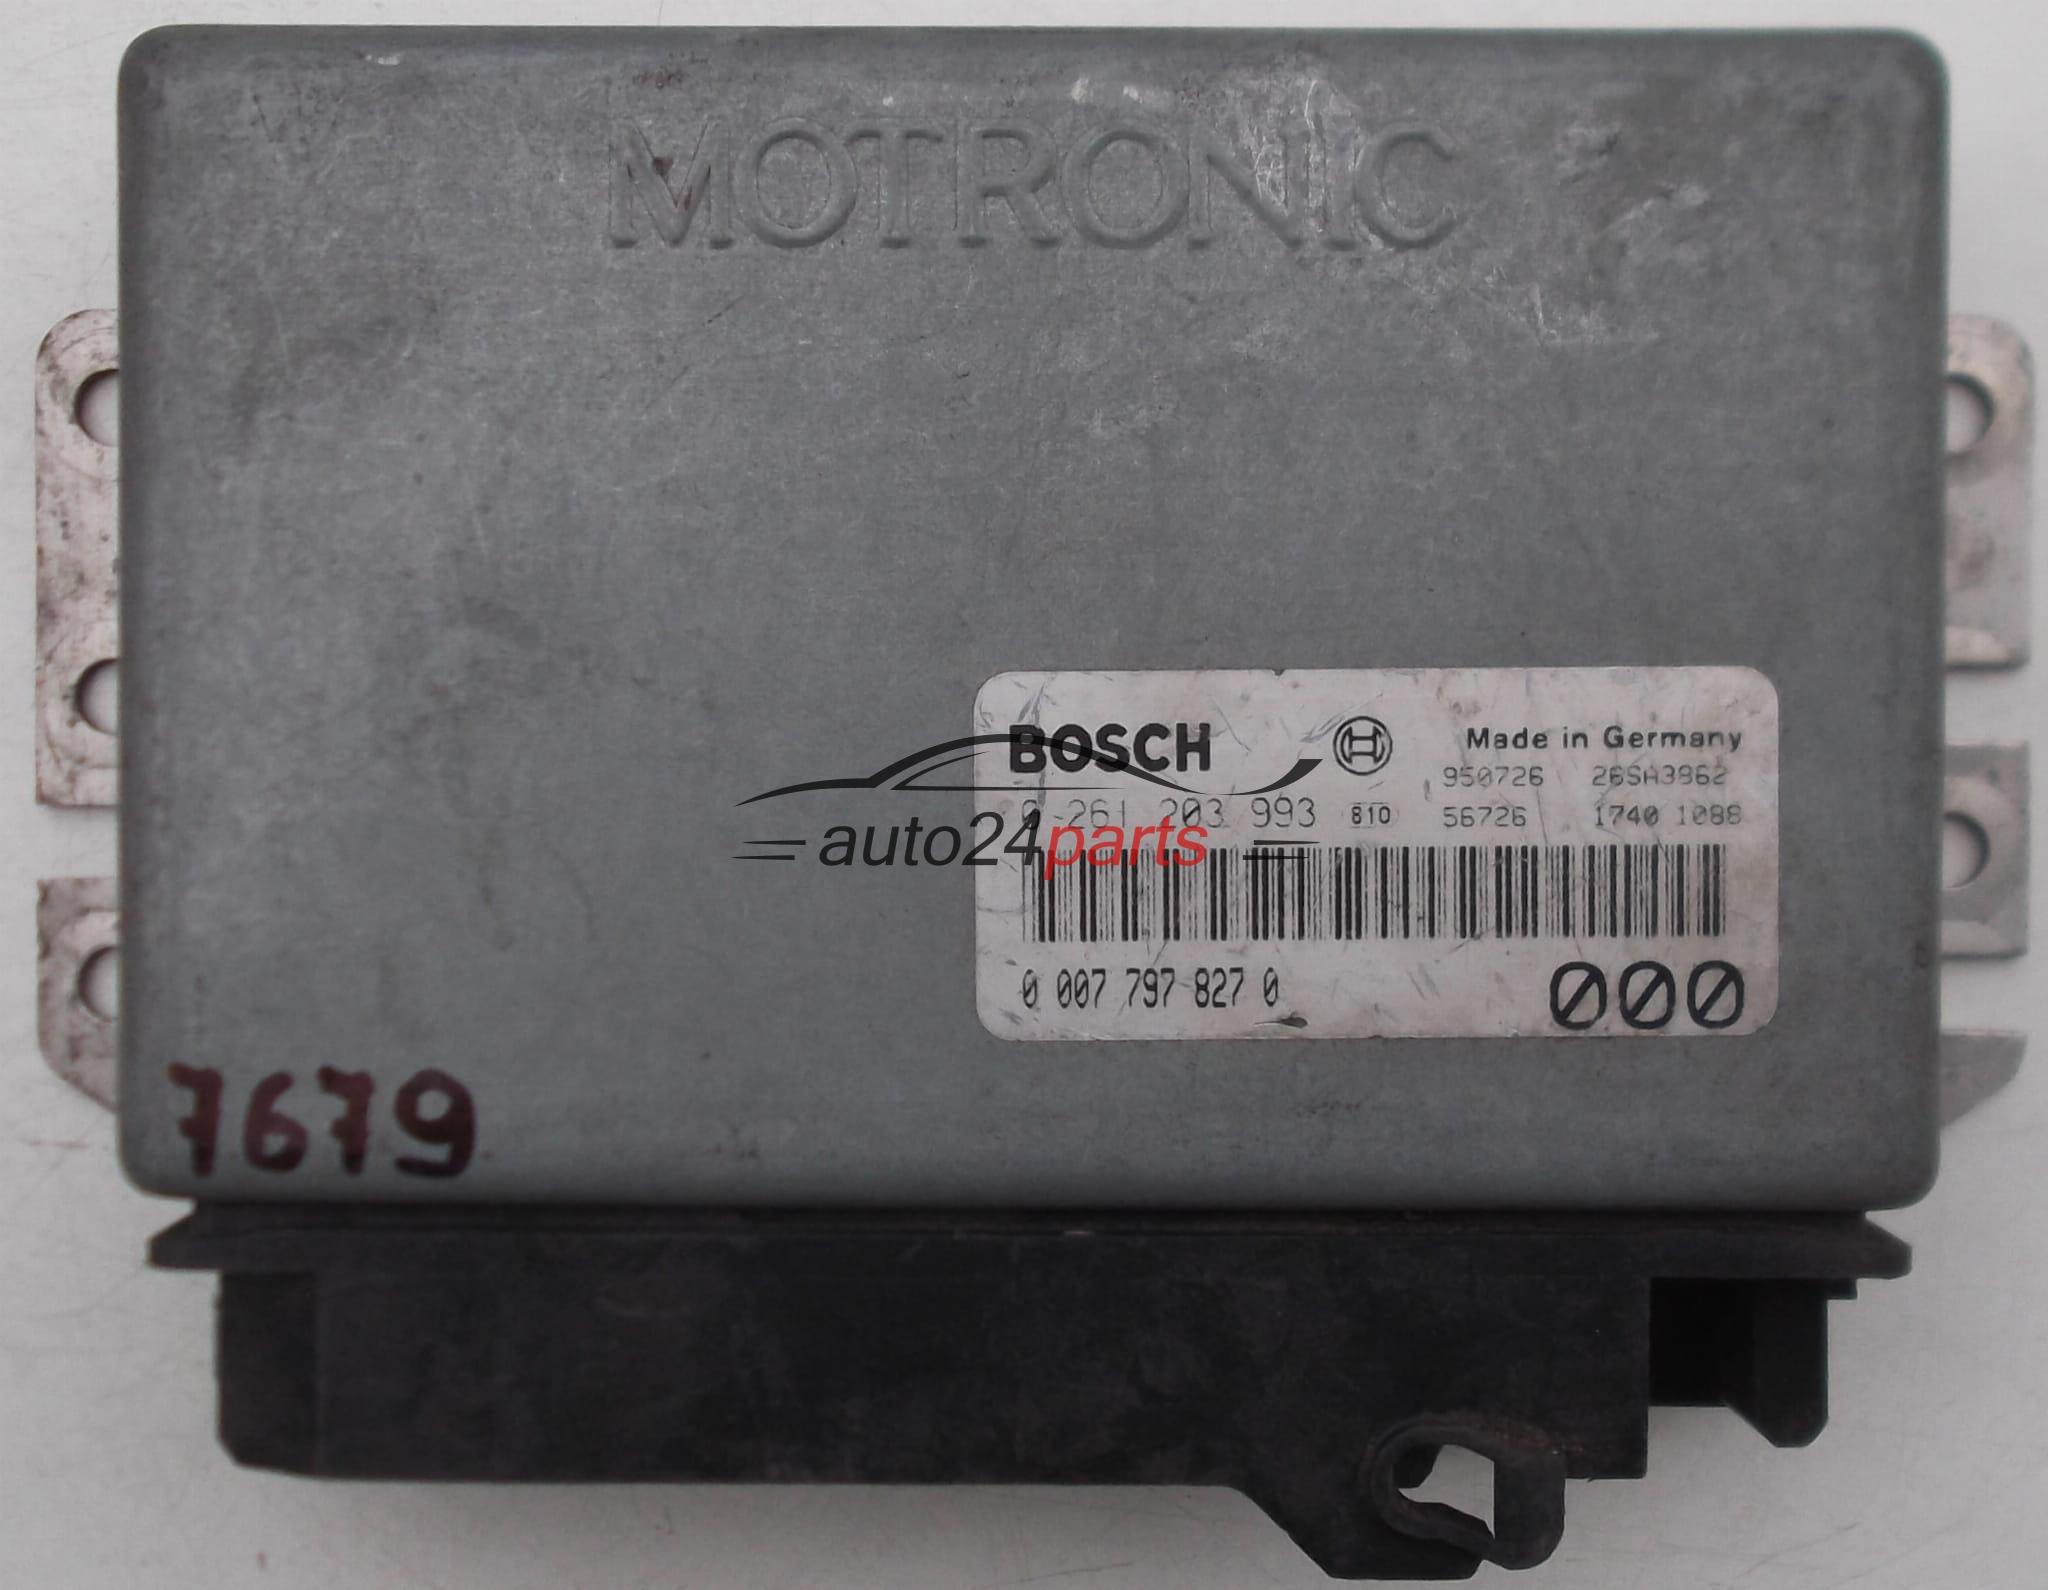 ECU ENGINE CONTROLLER ALFA ROMEO 155 1 8 TS 2 0 TS BOSCH 0 261 203